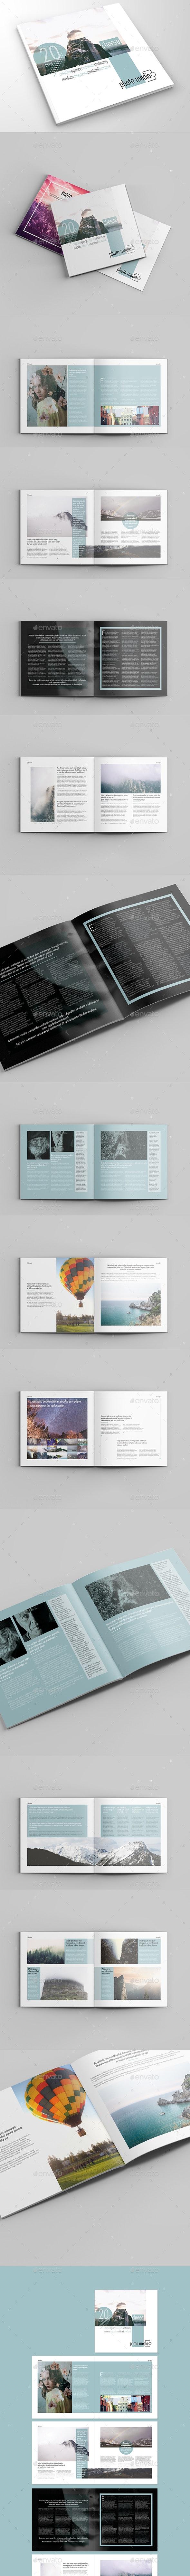 Photo Media Square Catalog&Brochure - Brochures Print Templates